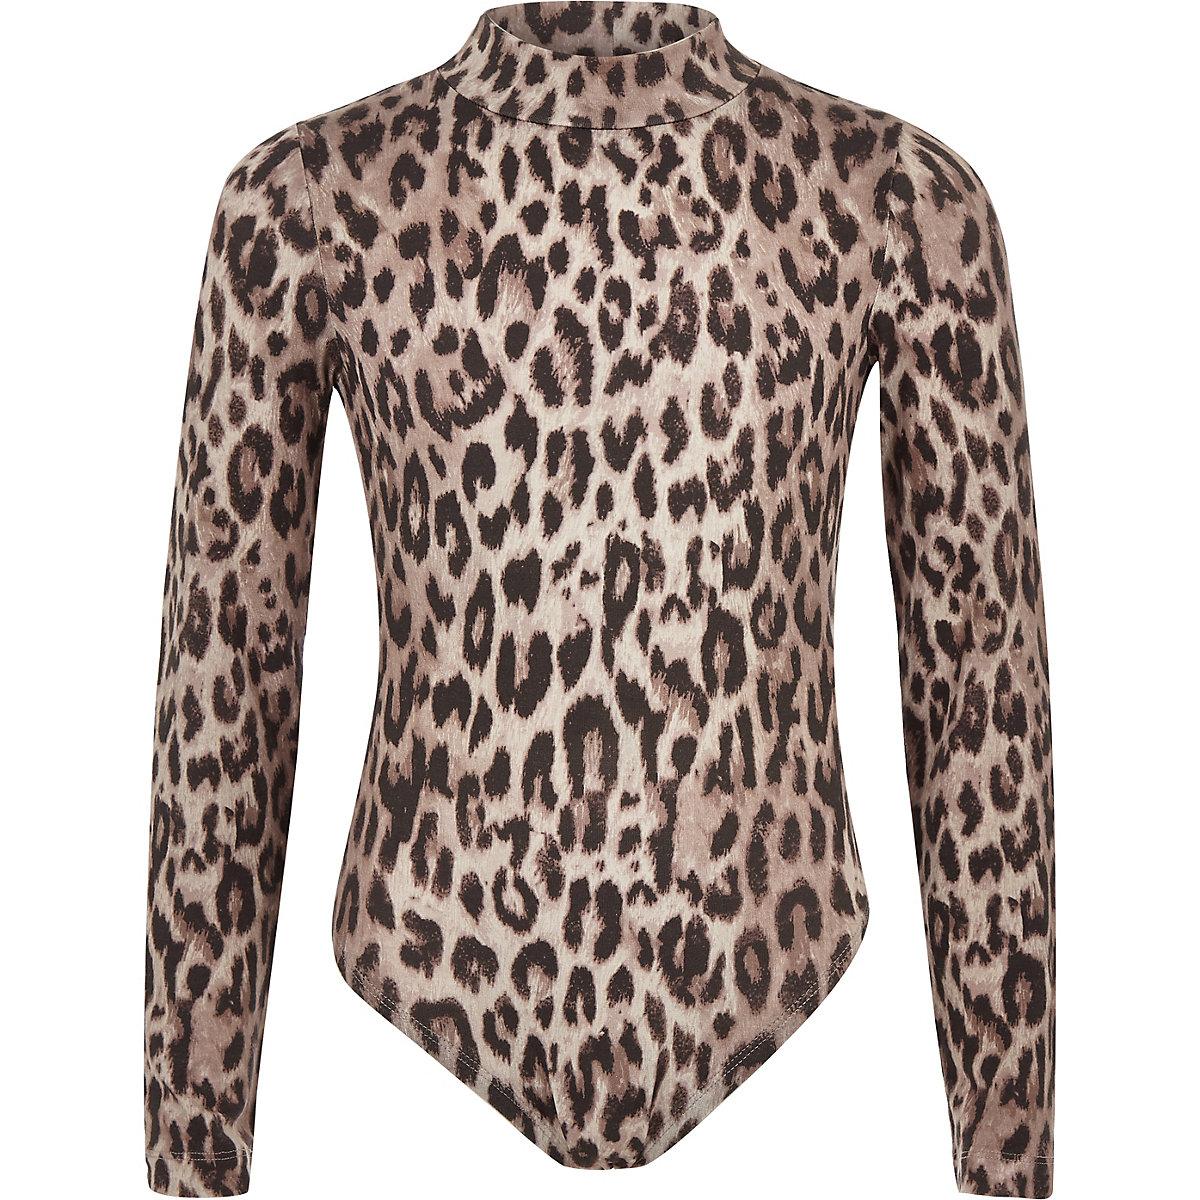 Girls grey leopard print bodysuit